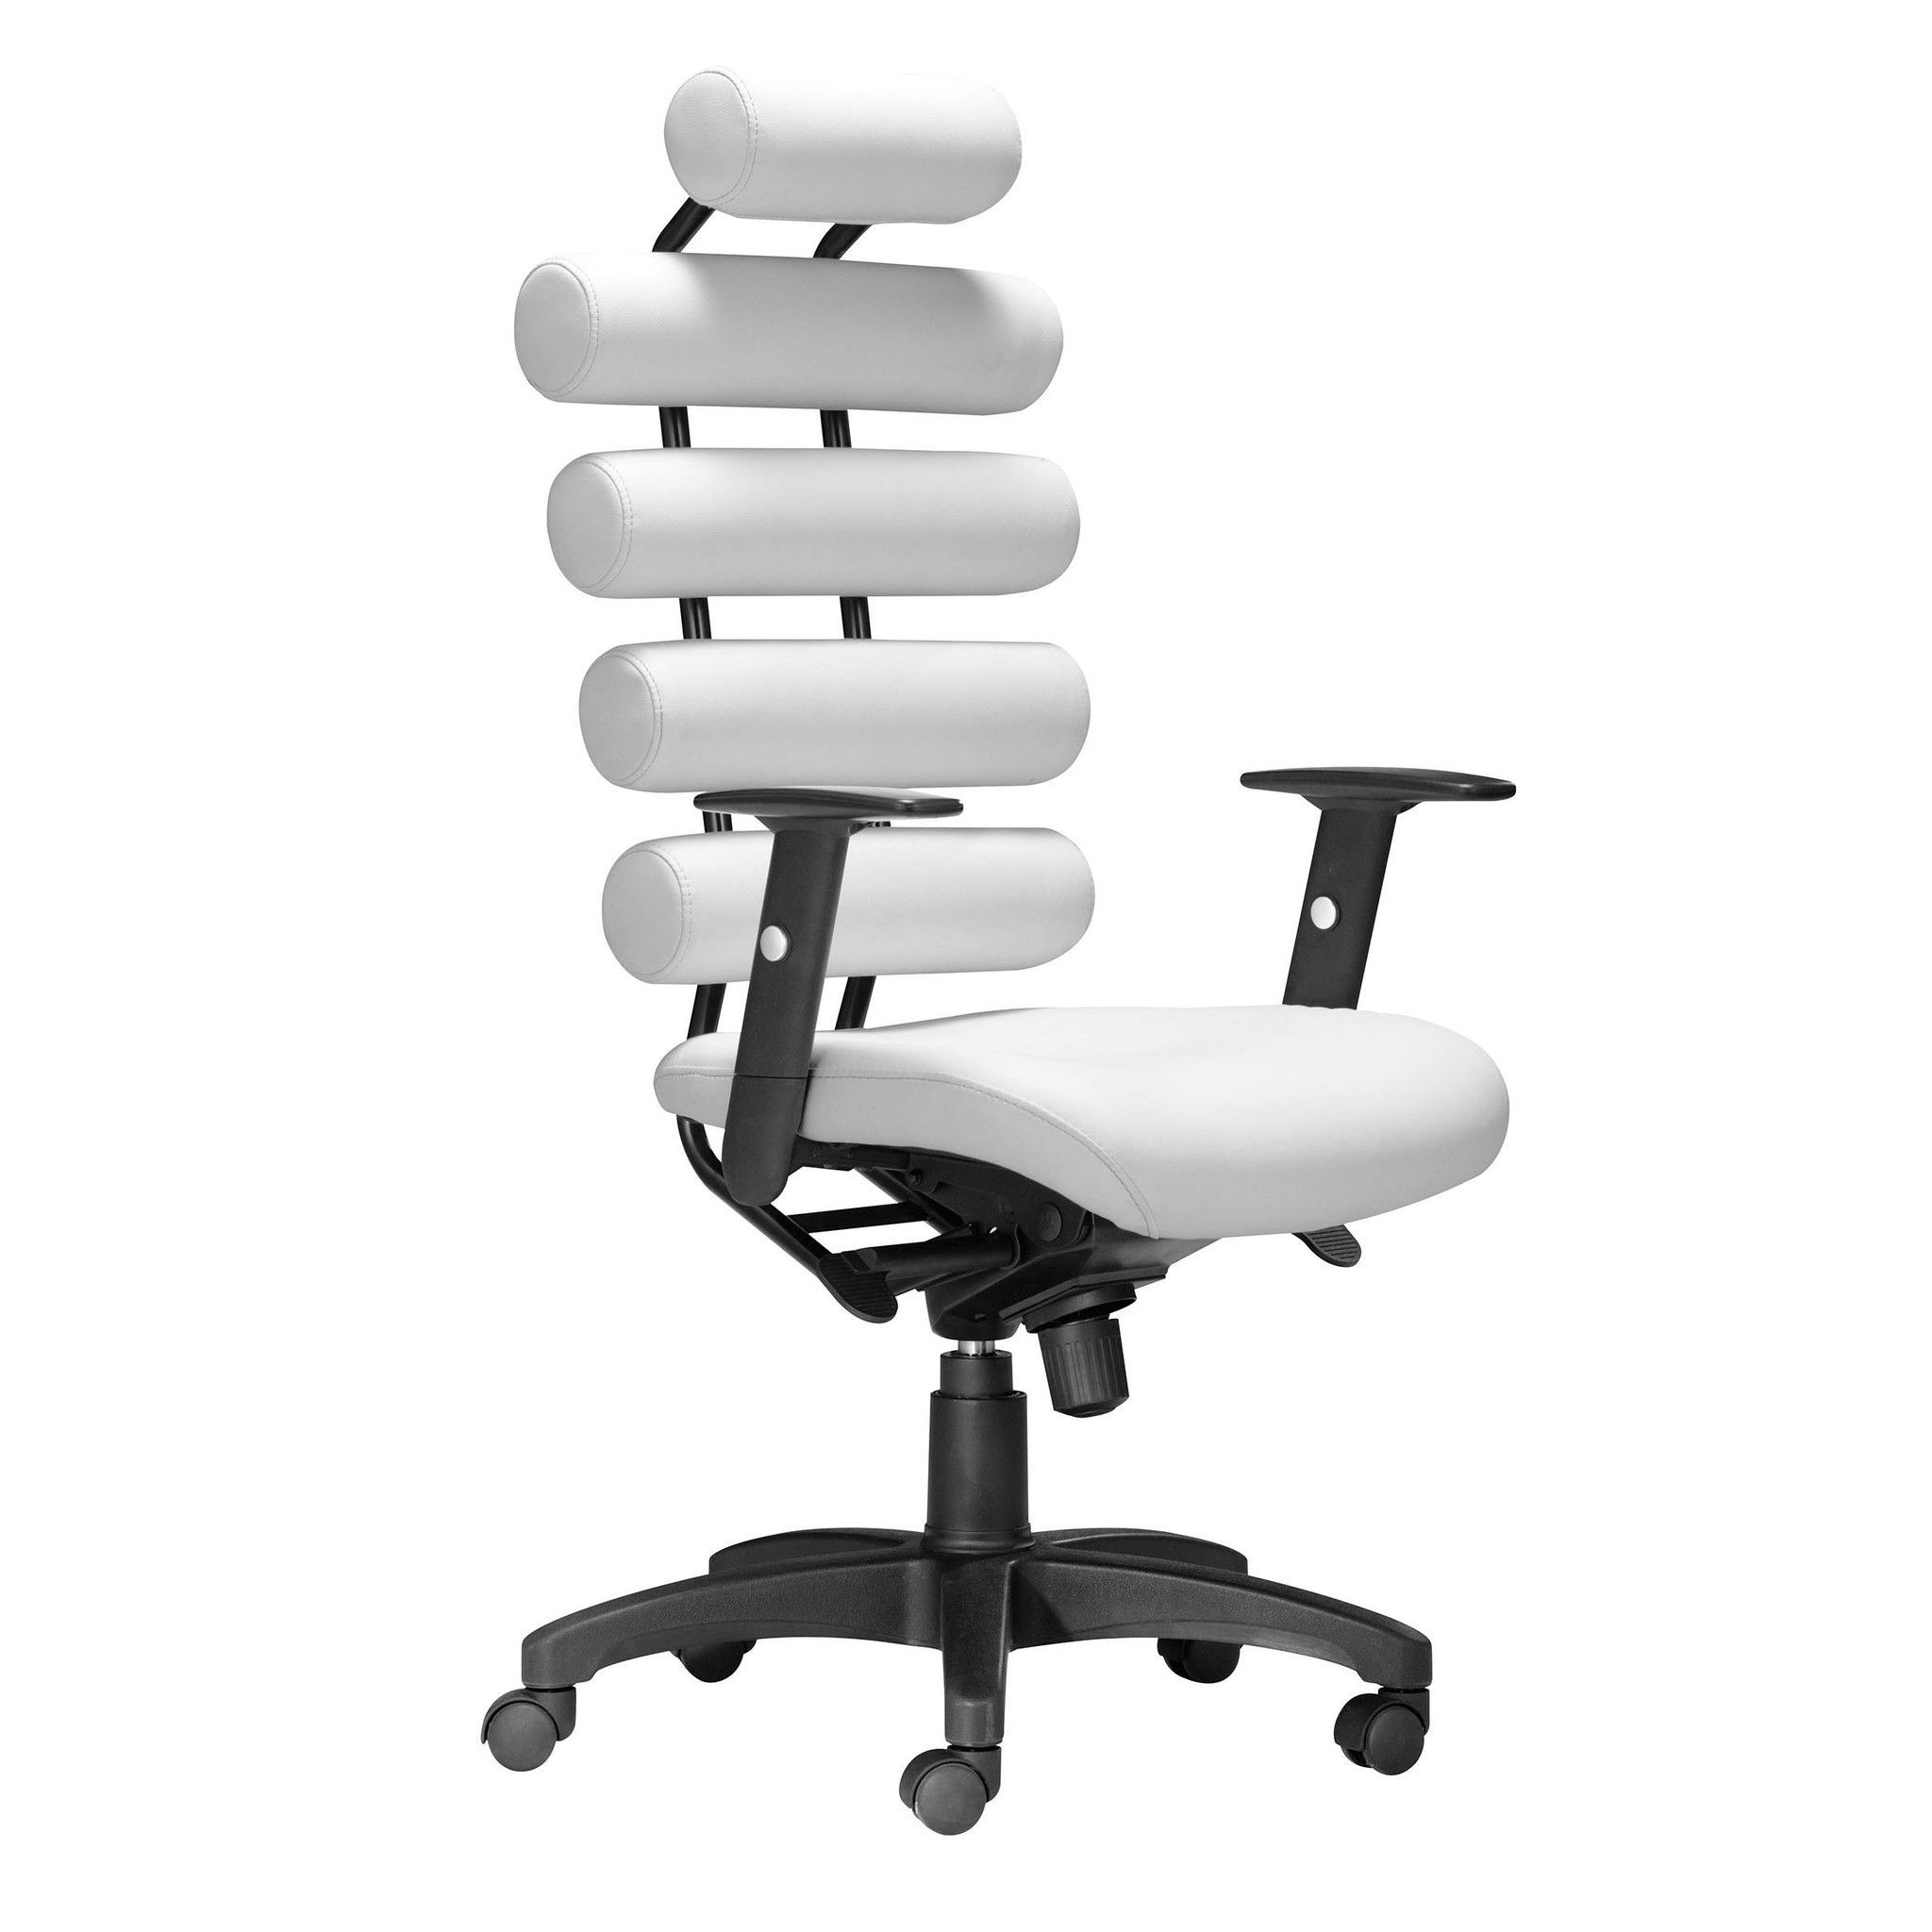 Unico Office Chair White  Modern office chair, White office chair